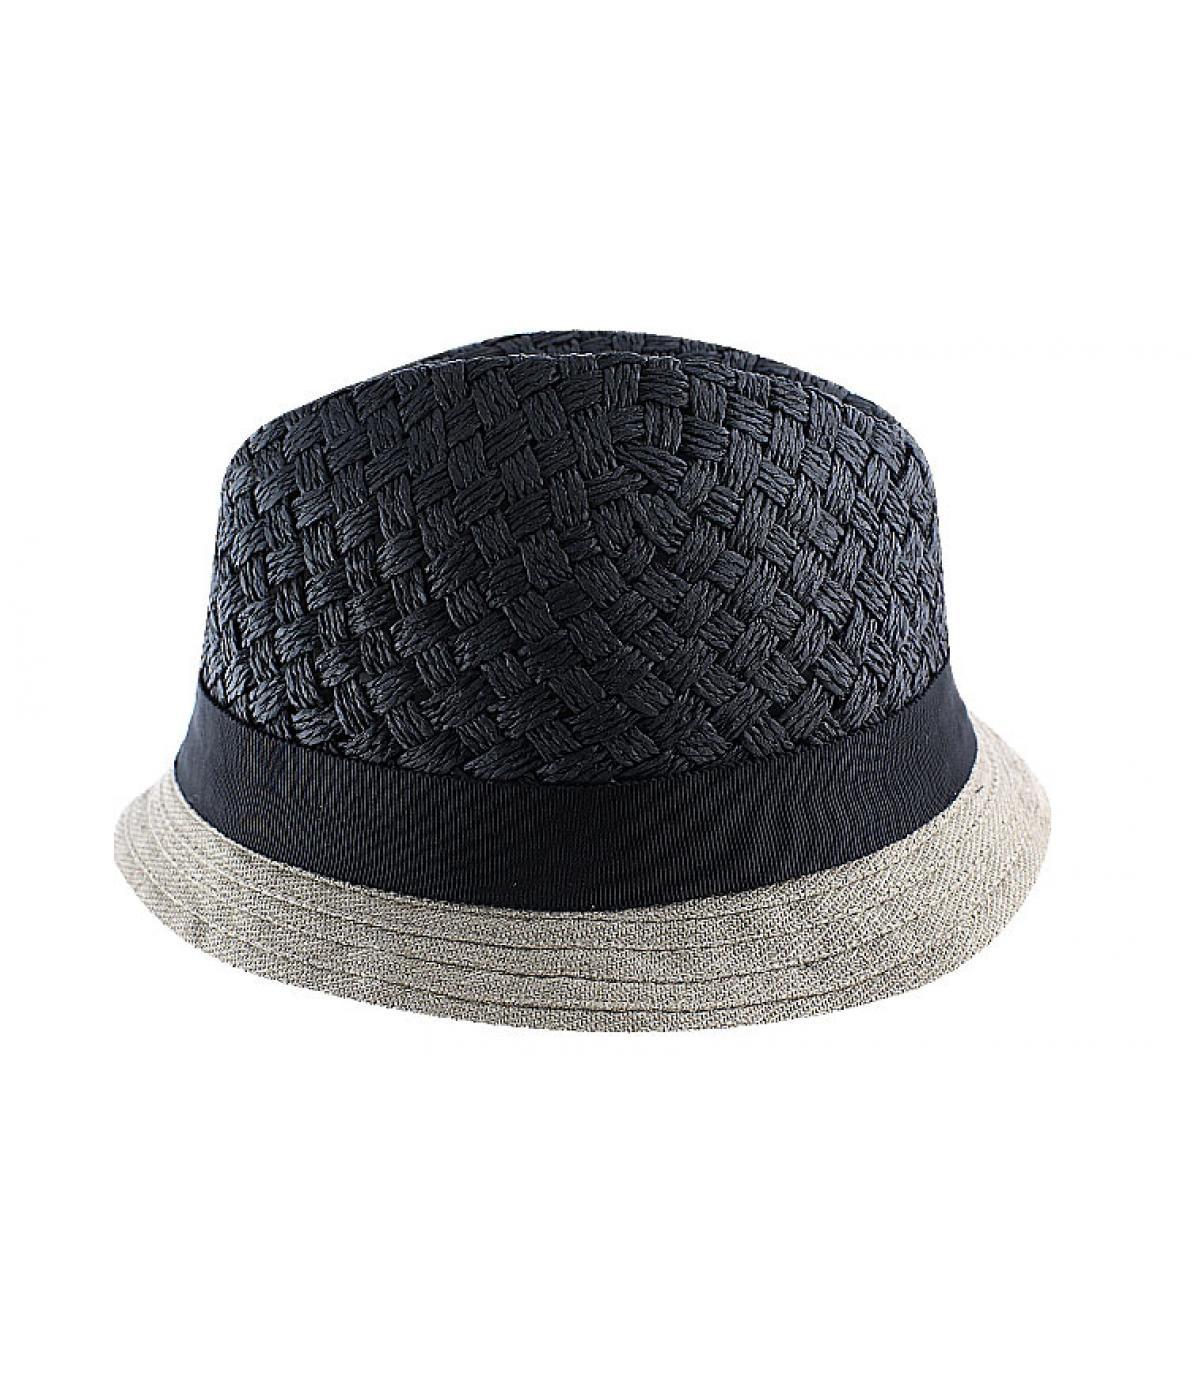 Céline Robert black hat